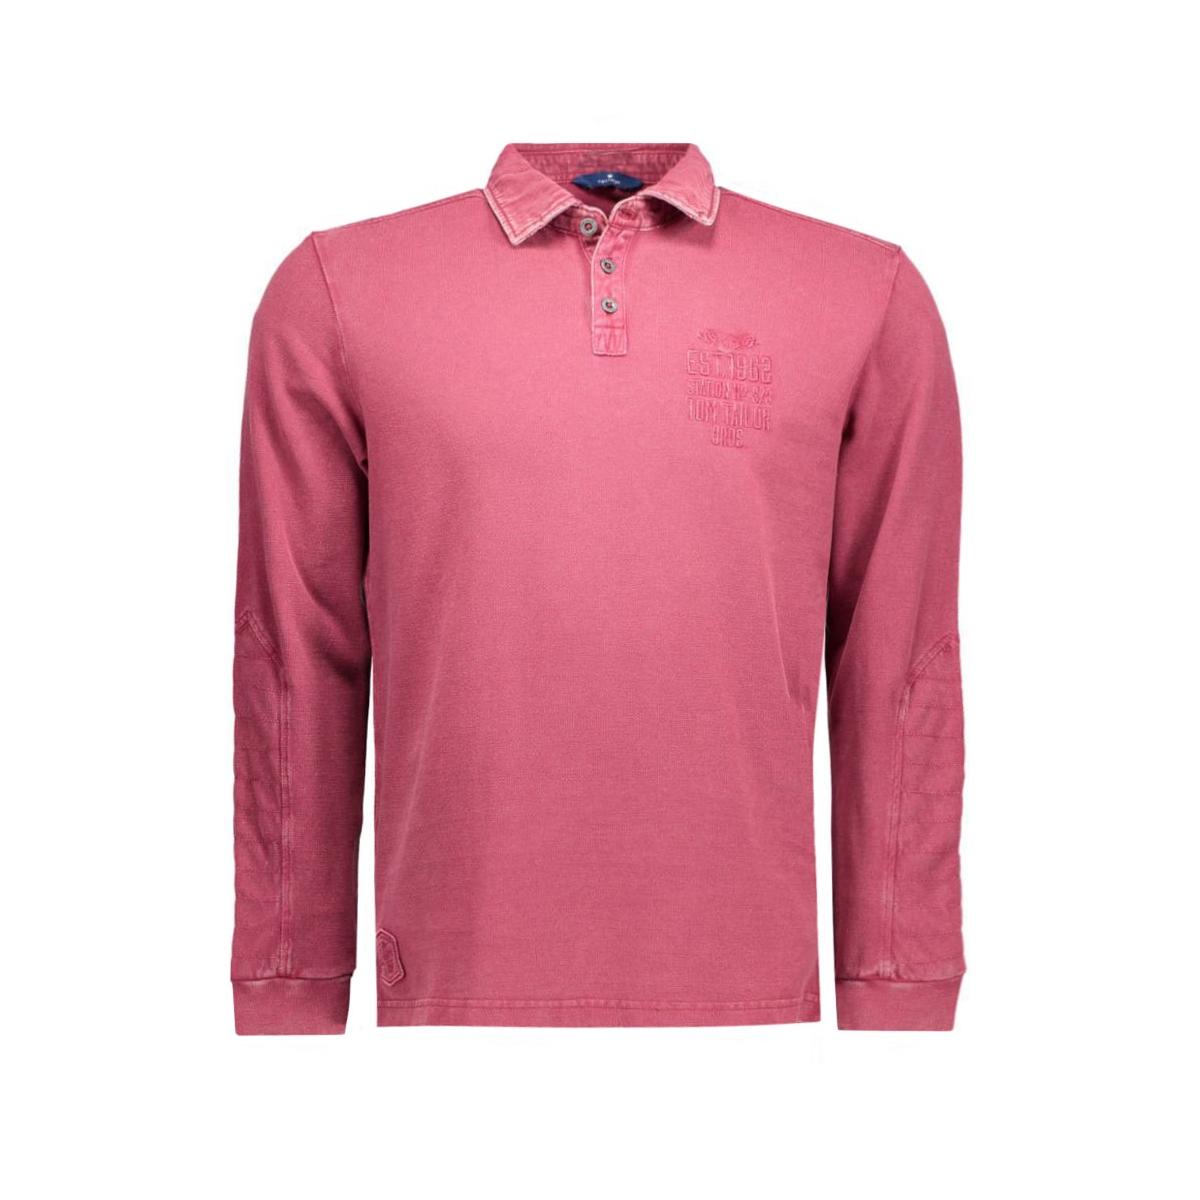 1530968.00.10 tom tailor polo 4559